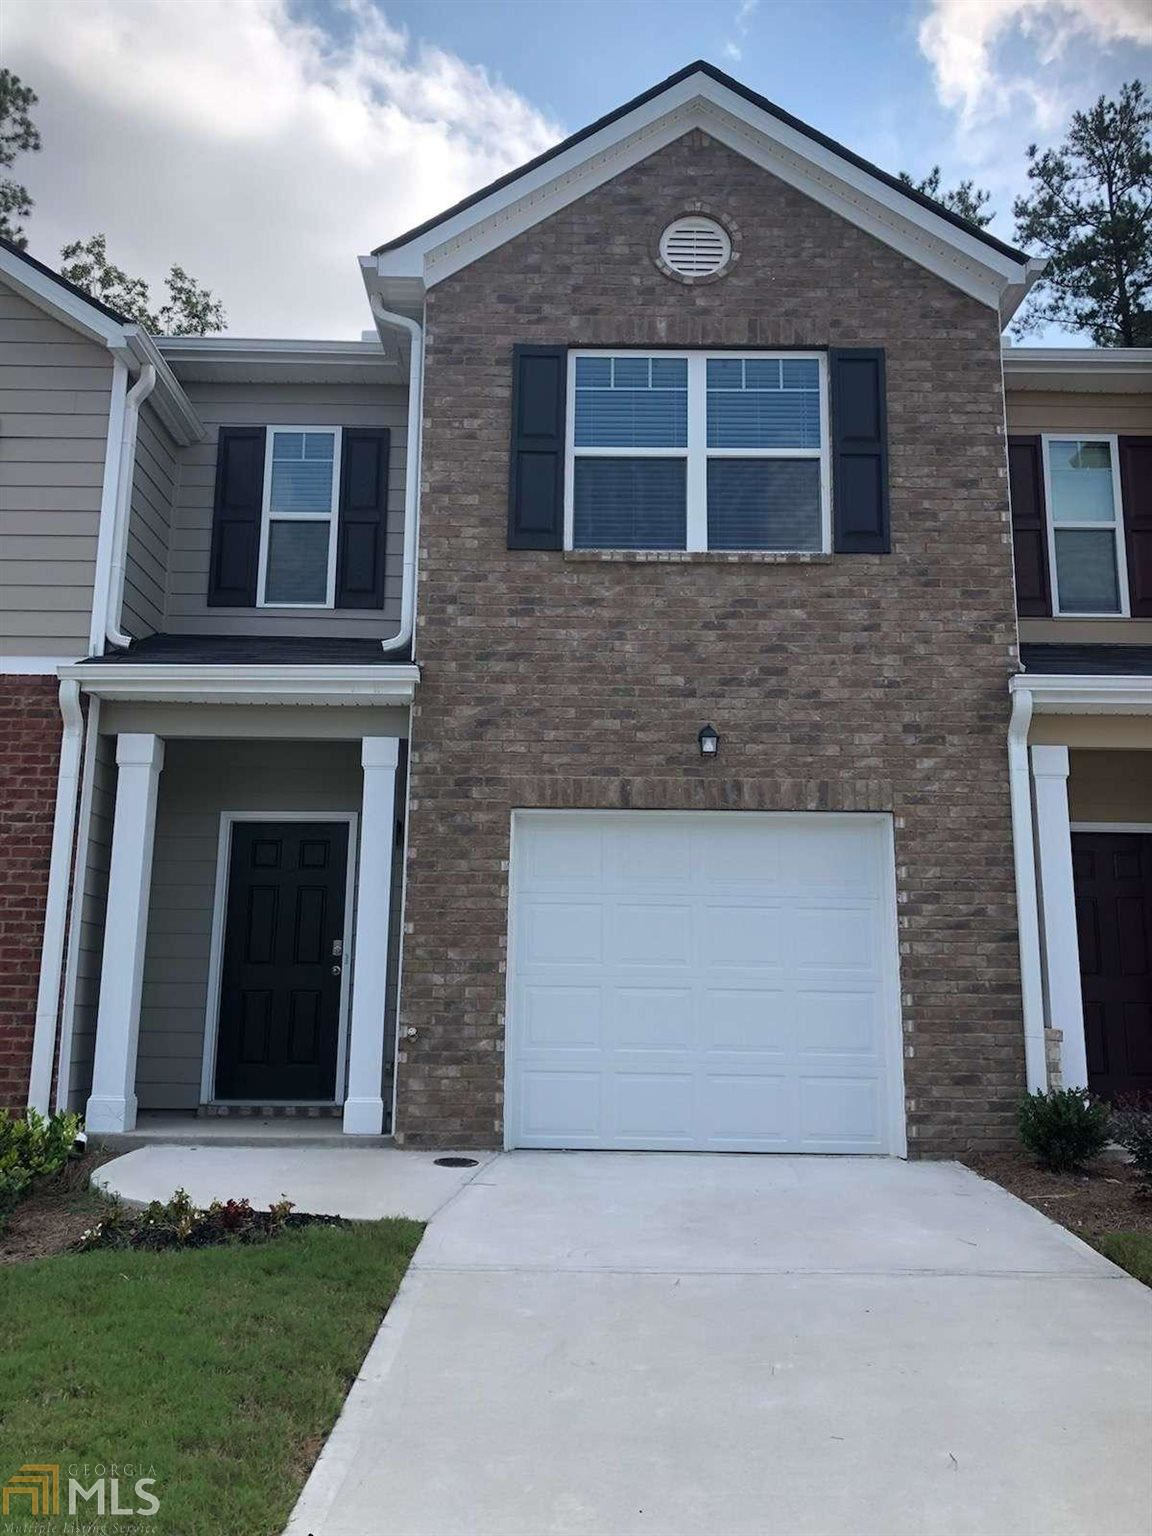 6118 Rockaway, Atlanta, GA 30349 - MLS#: 8904369